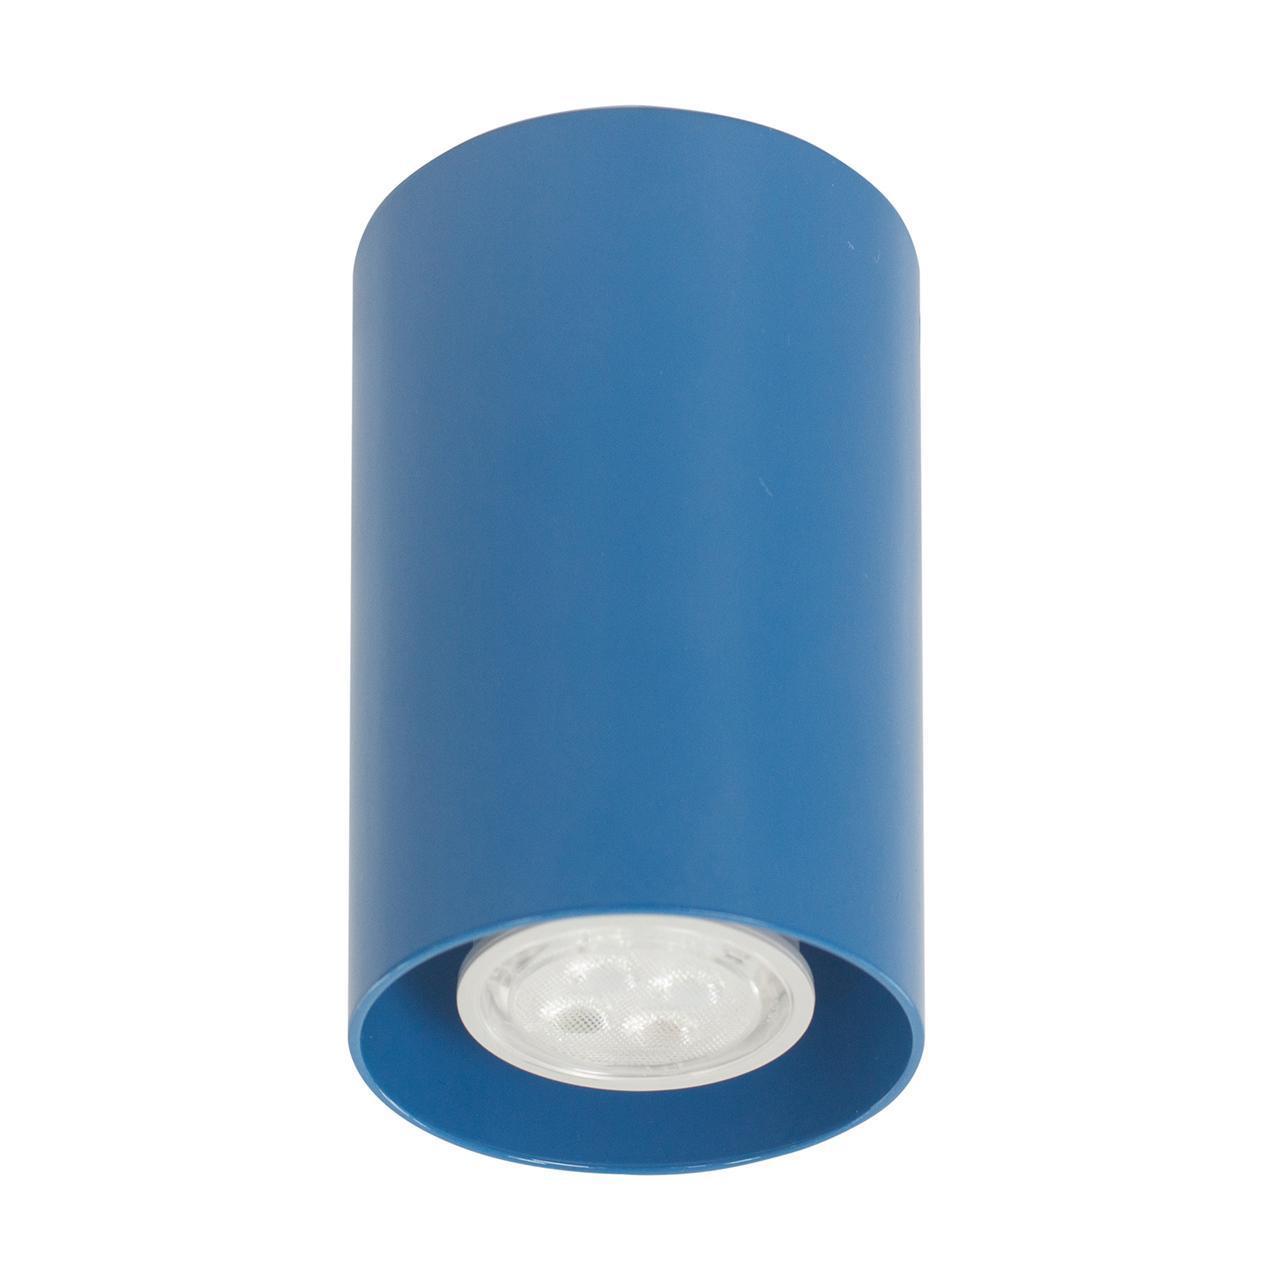 светильник артпром tubo6 p tubo6 p1 12 Потолочный светильник Артпром Tubo6 P1 18